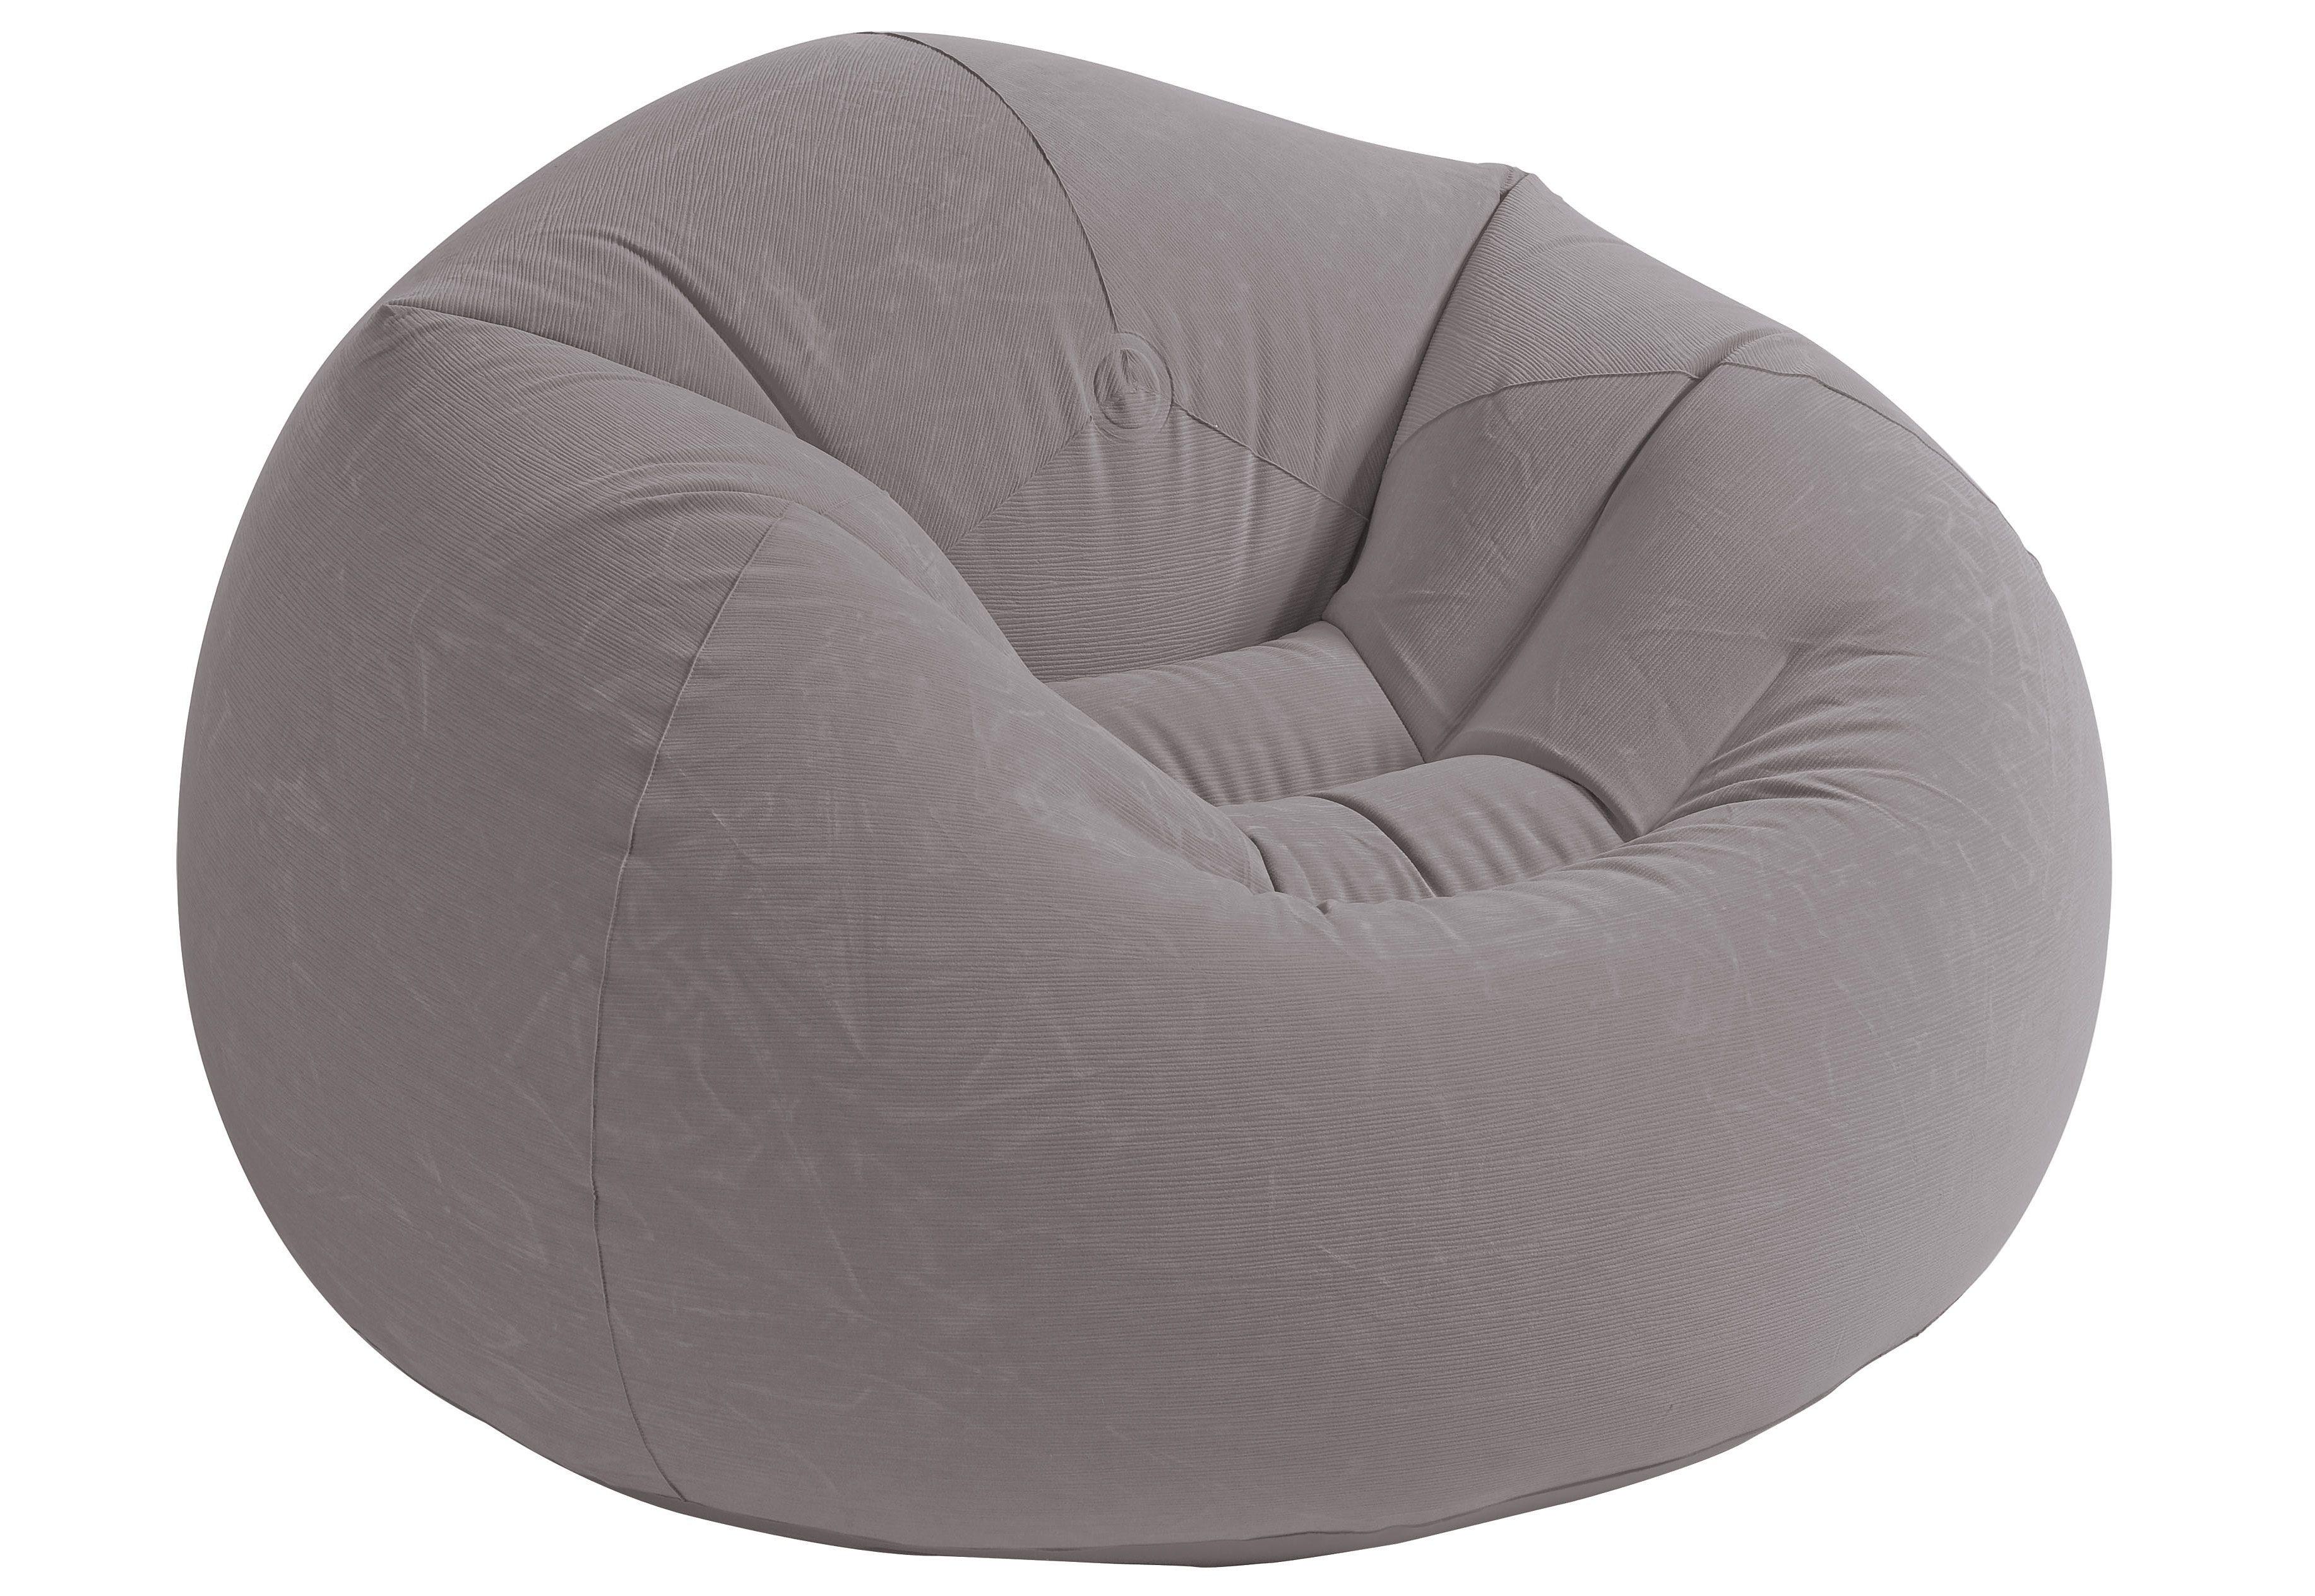 Sessel, aufblasbar, »Beanless Bag™ Chair«, Intex